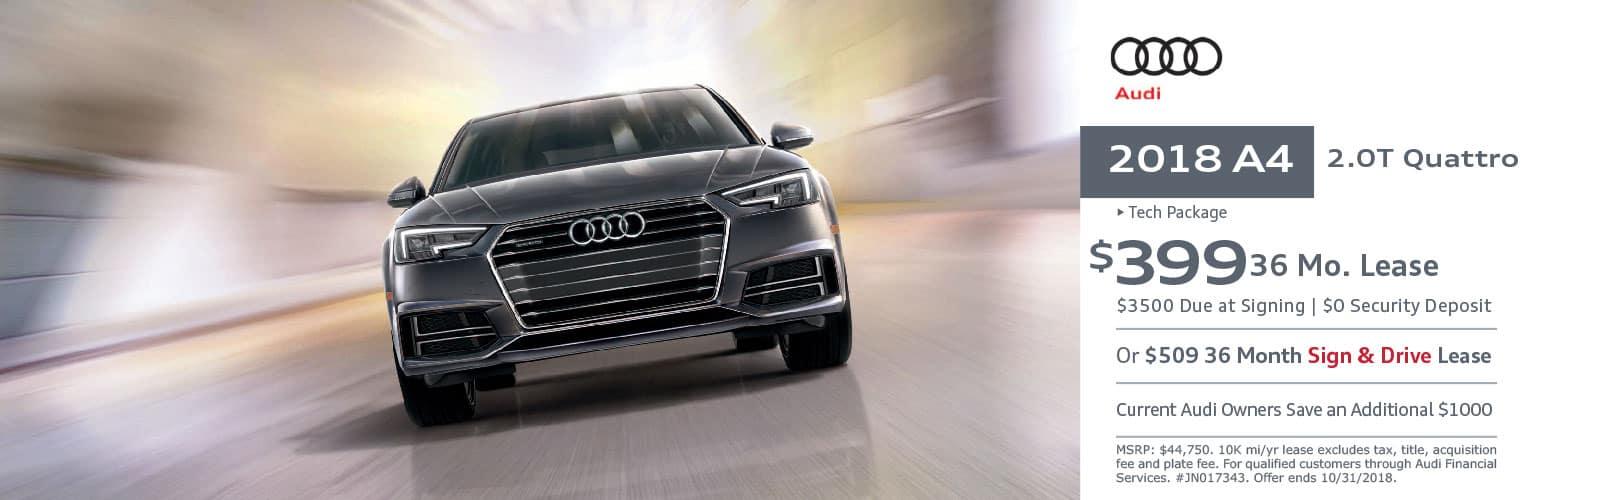 Audi Lease Deals Washington New Car Lease Specials Pittsburgh - Audi lease specials